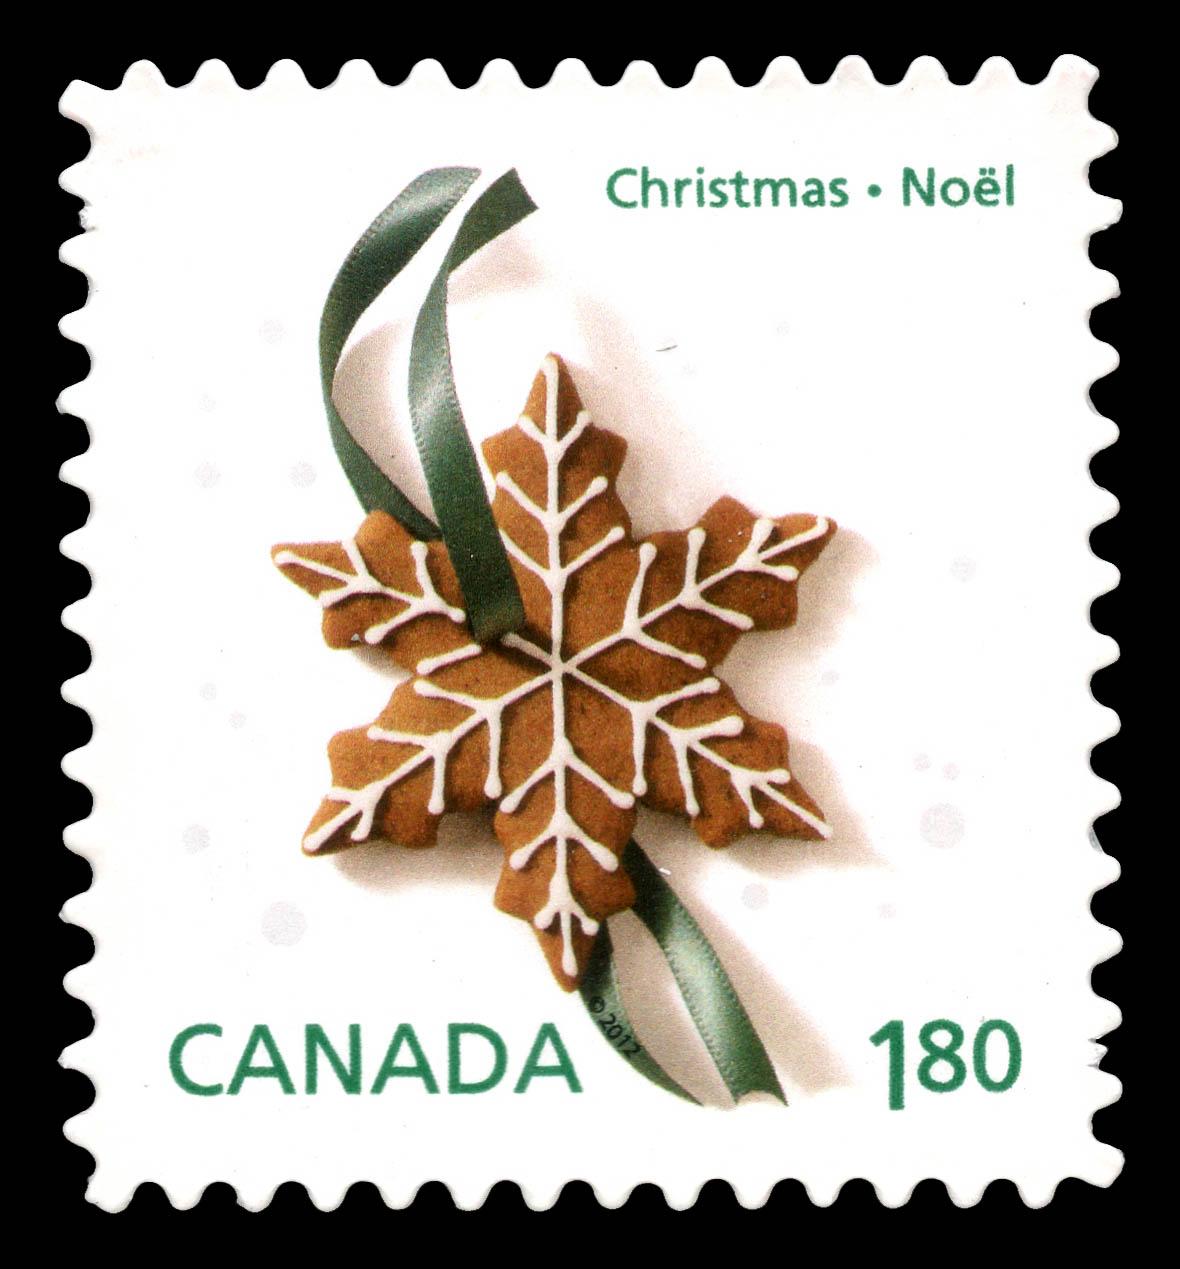 Gingerbread Snowflake Cookie Canada Postage Stamp | Christmas Cookies